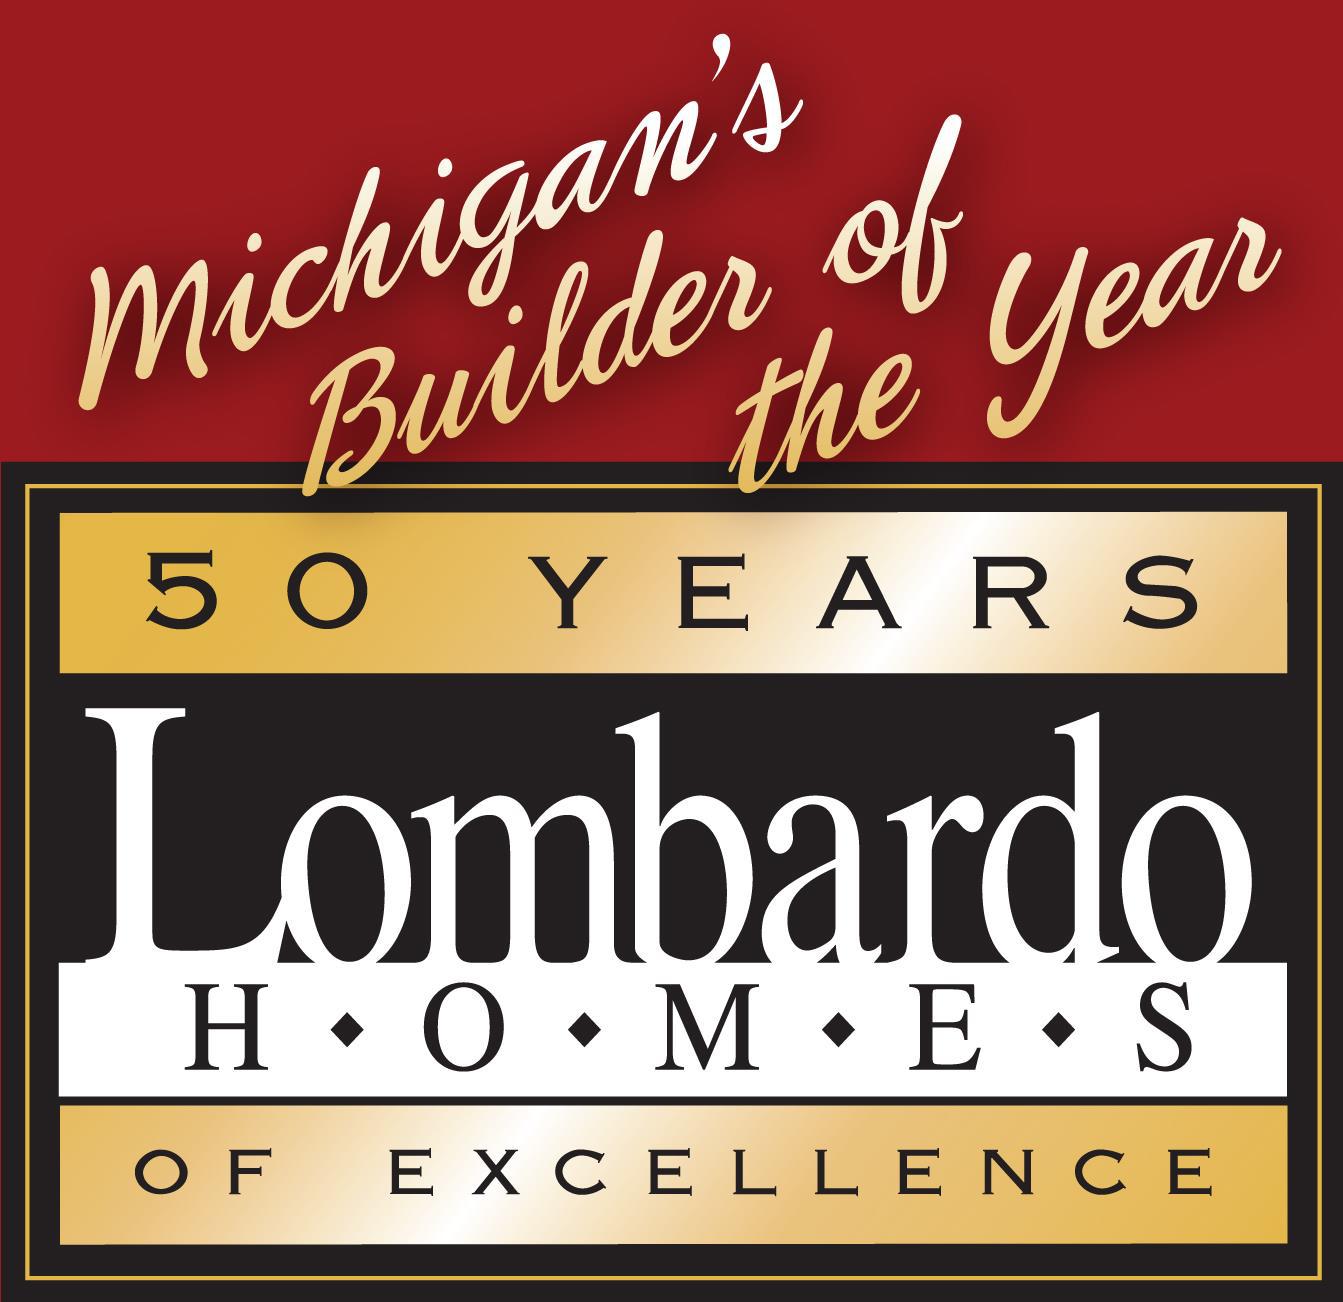 Lombardo Homes image 4